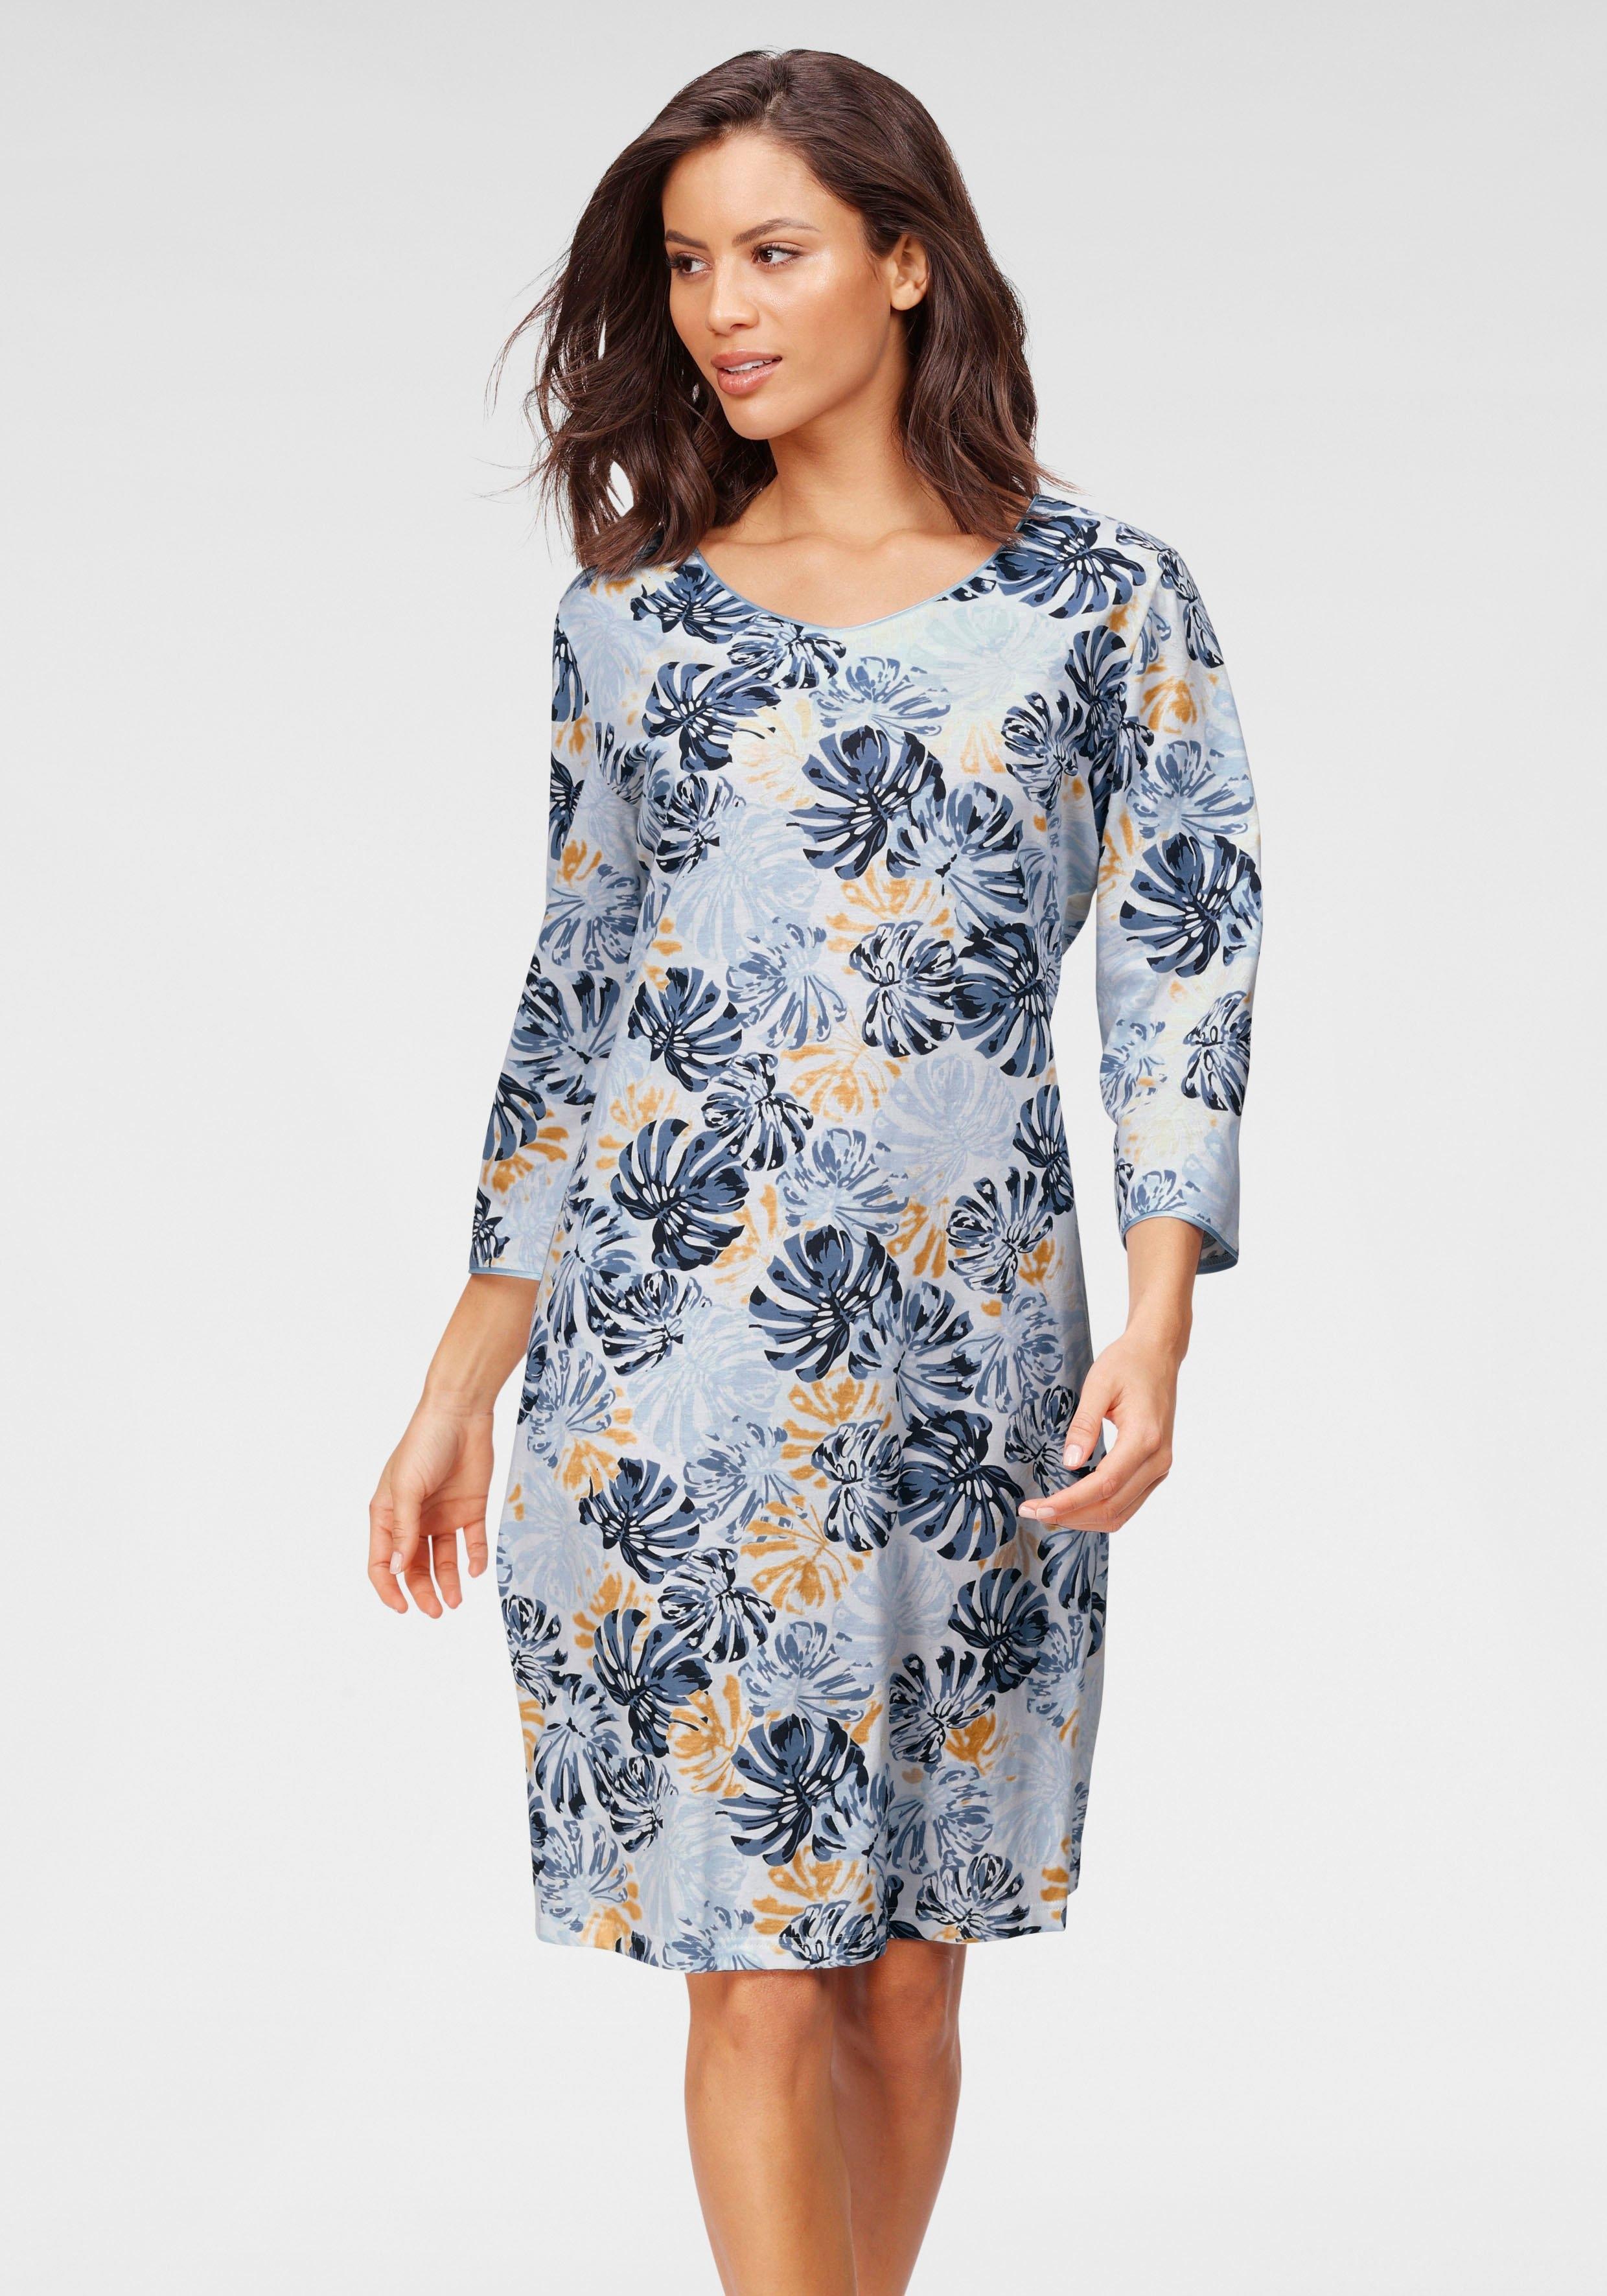 Cybèle nachthemd met bladerprint goedkoop op lascana.nl kopen